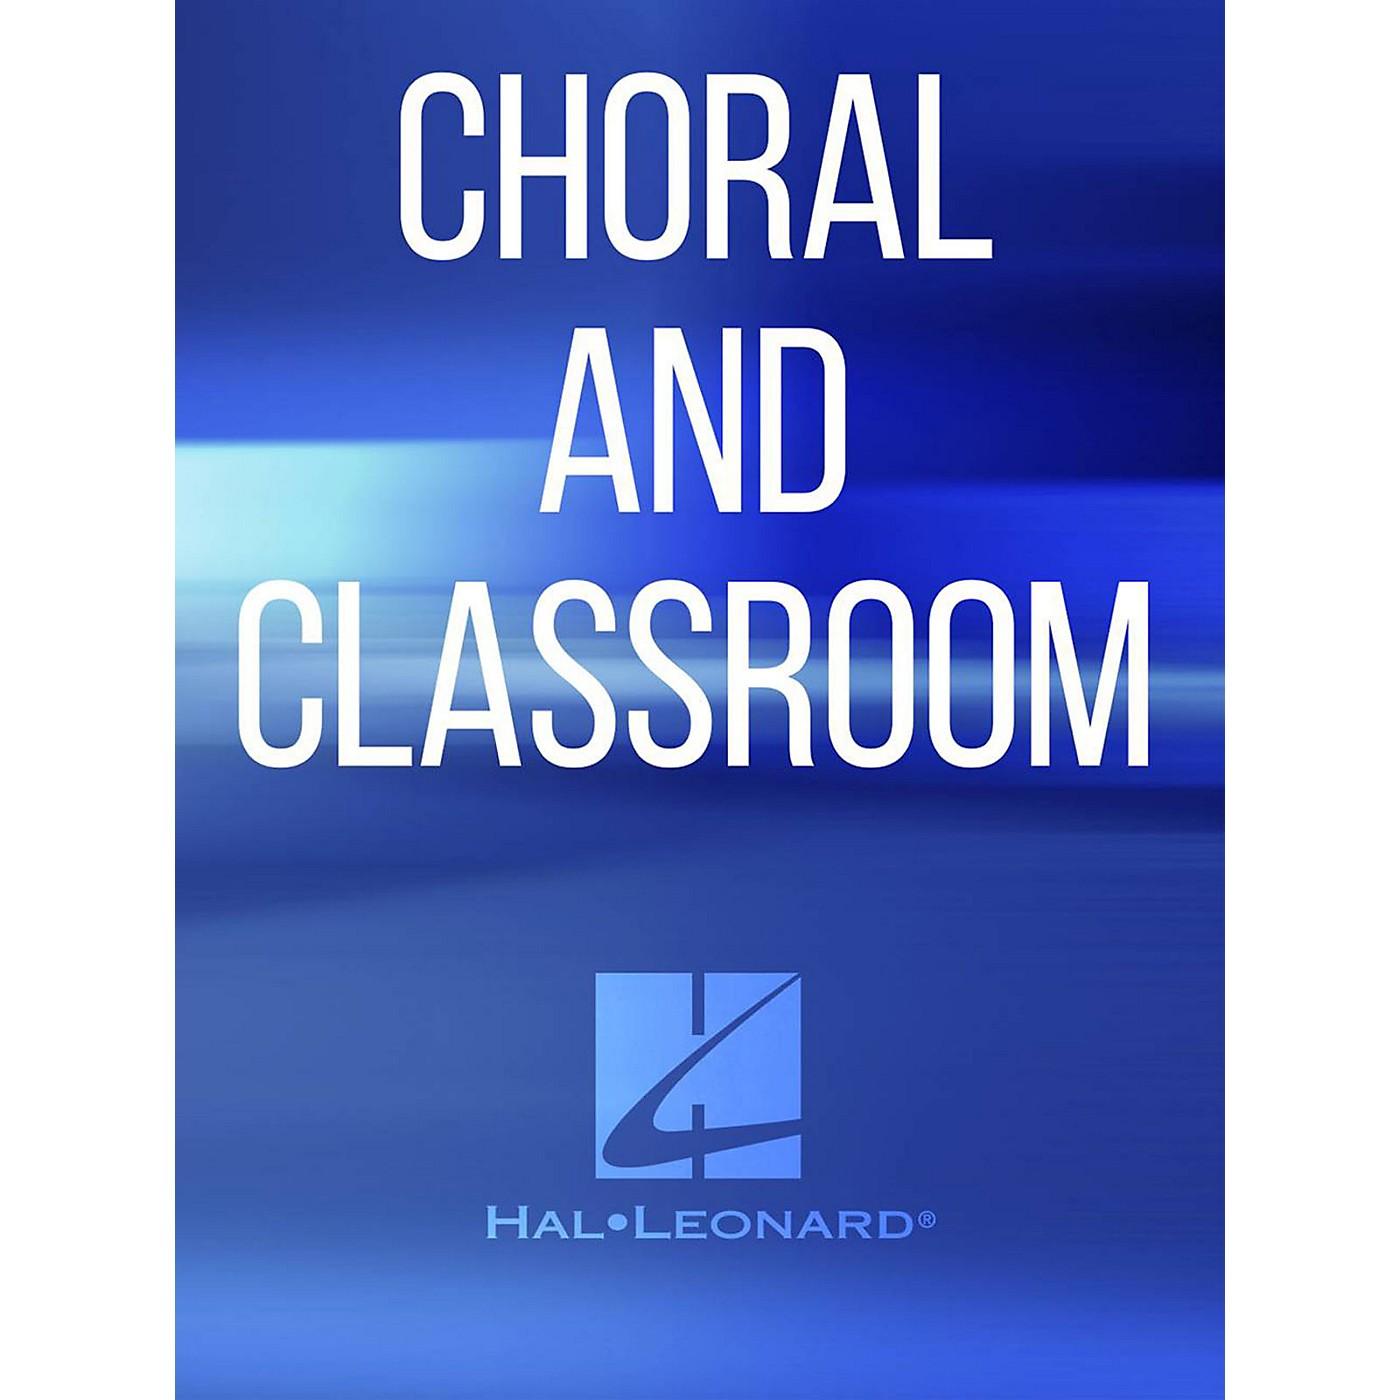 Hal Leonard Everybody Has Music Inside - Featuring Songs of Greg & Steve (Musical) Singer 5 Pak by Alan Billingsley thumbnail